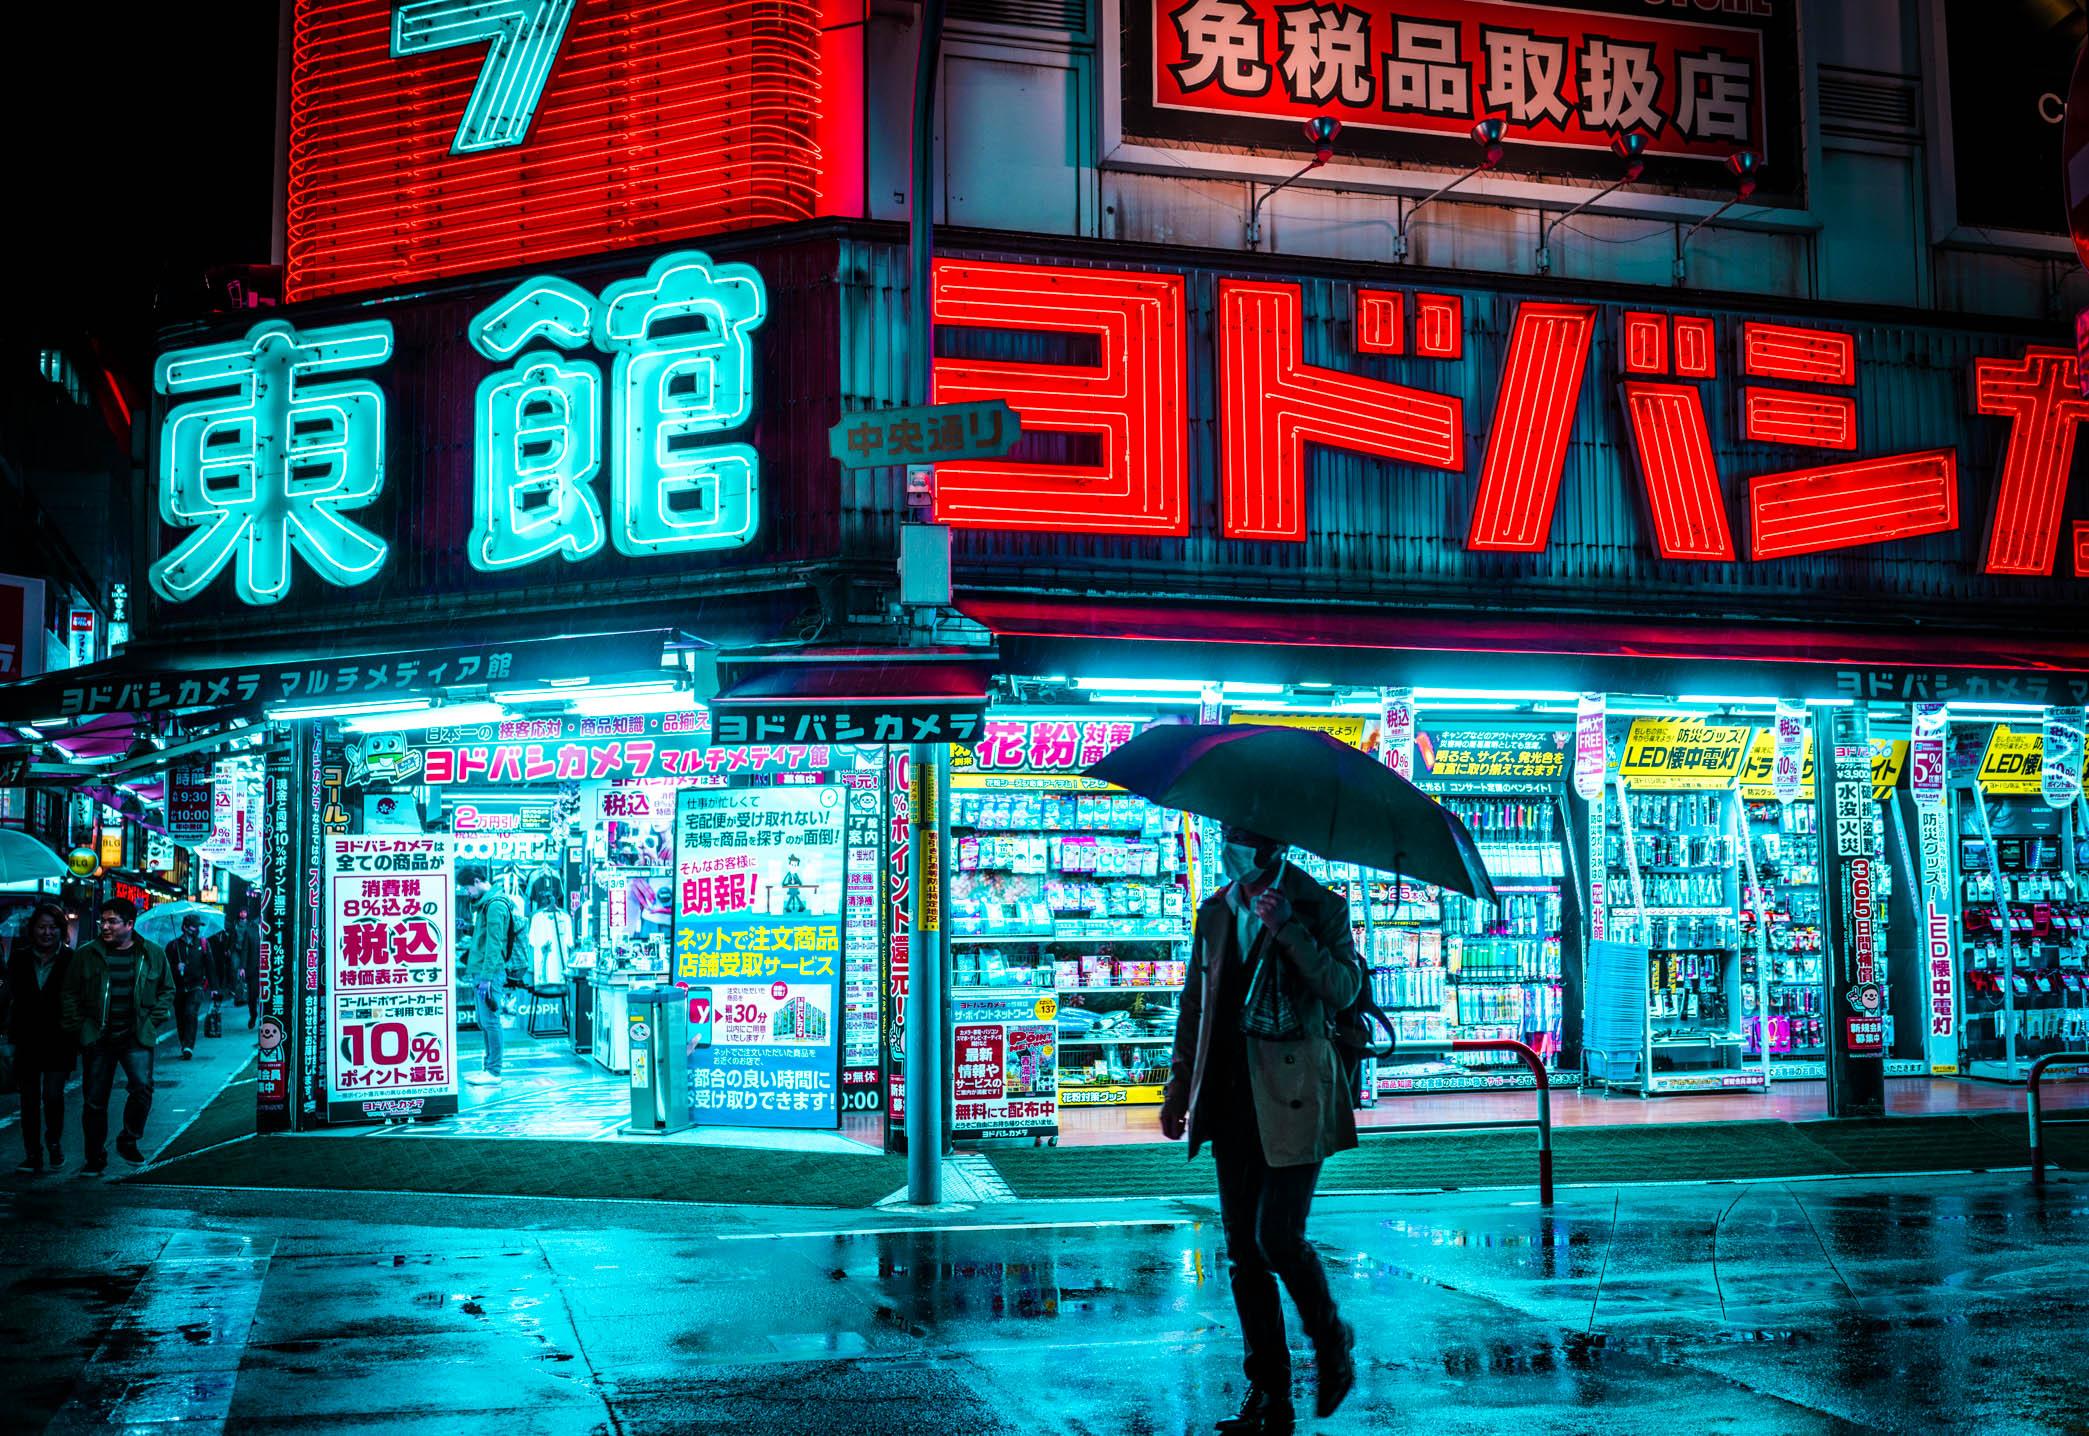 Wallpaper Cyberpunk Tokyo Japan Rain 2089x1436 Wallsource 1442051 Hd Wallpapers Wallhere